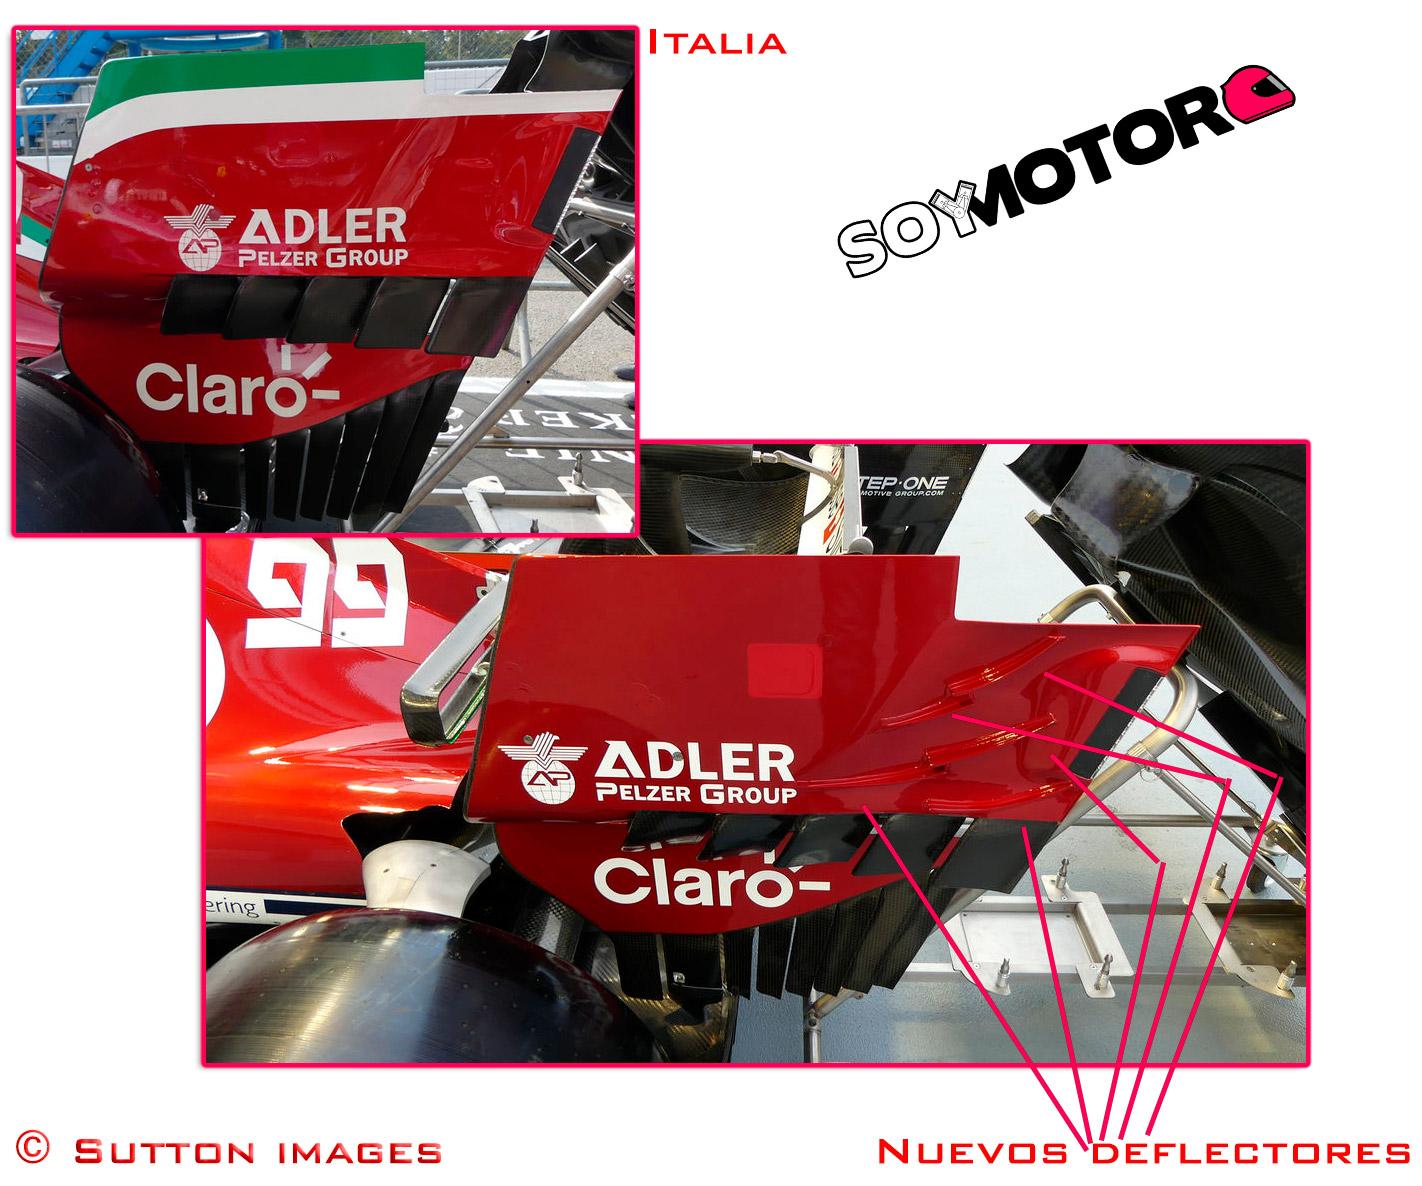 alfa-romeo-endplate-ala-trasera-soymotor.jpg